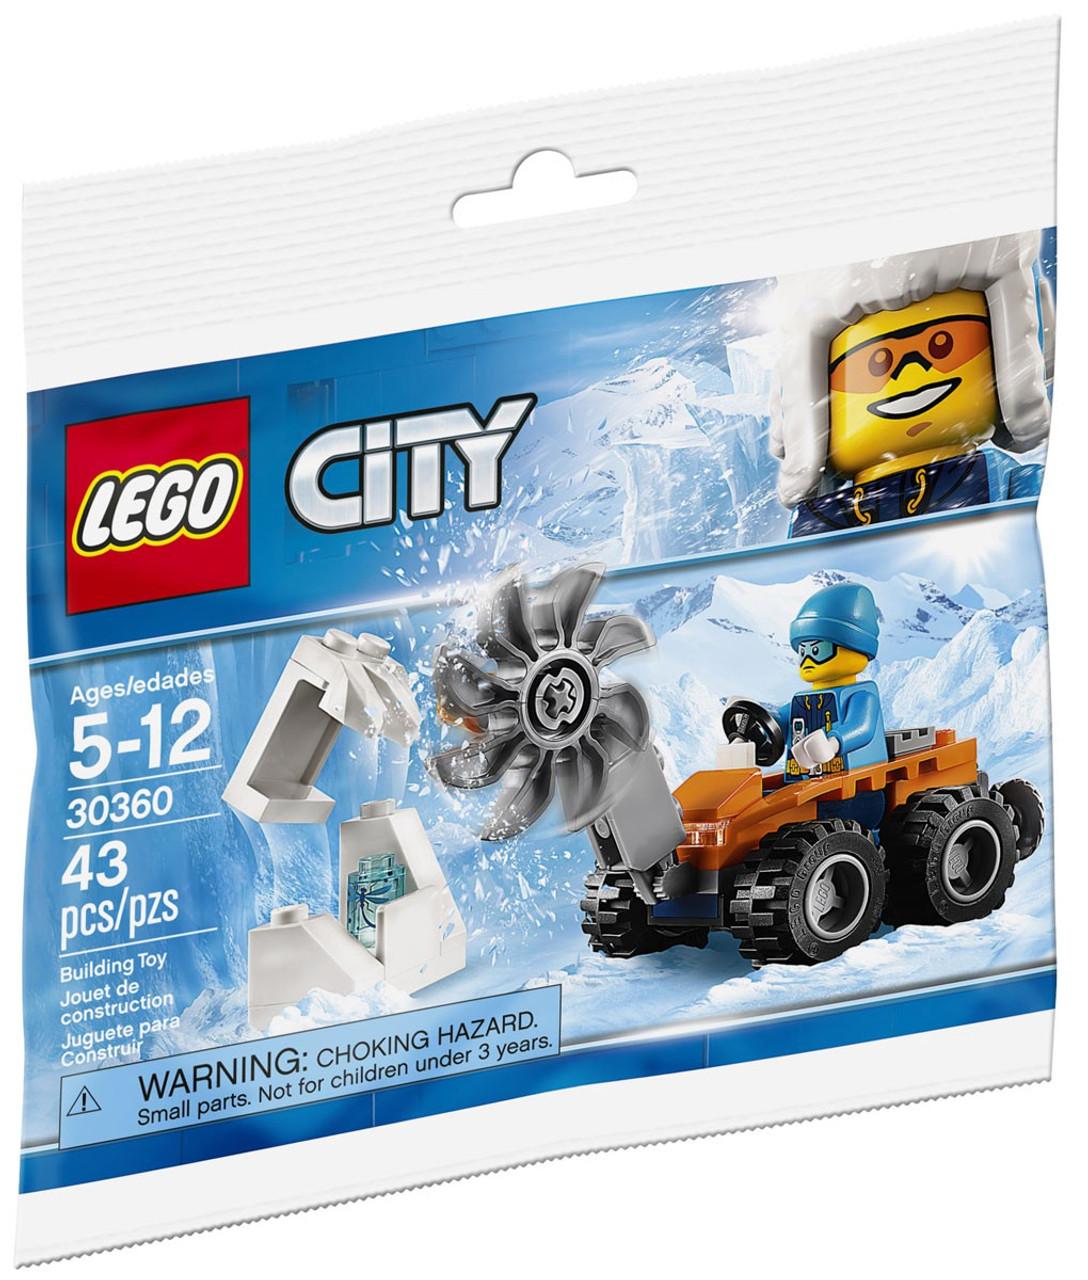 cc6e60549f1c LEGO City Arctic Ice Saw Mini Set 30360 - ToyWiz